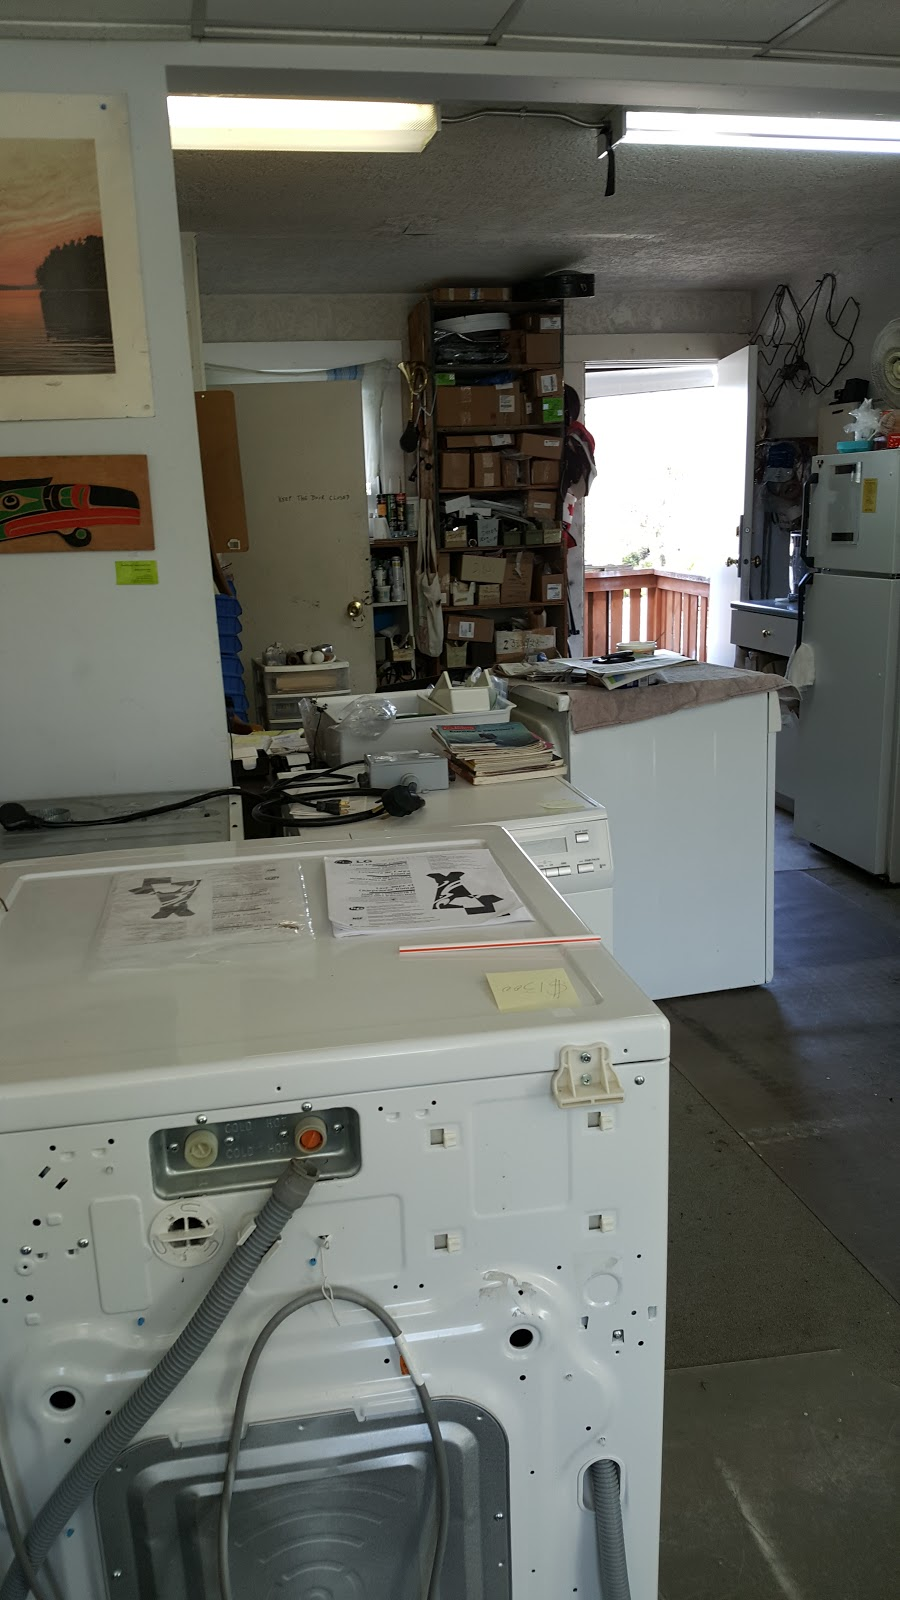 Quadra Appliances Buy/Sell/ Repair   home goods store   3586 Quadra St, Victoria, BC V8X 1H2, Canada   2503886839 OR +1 250-388-6839